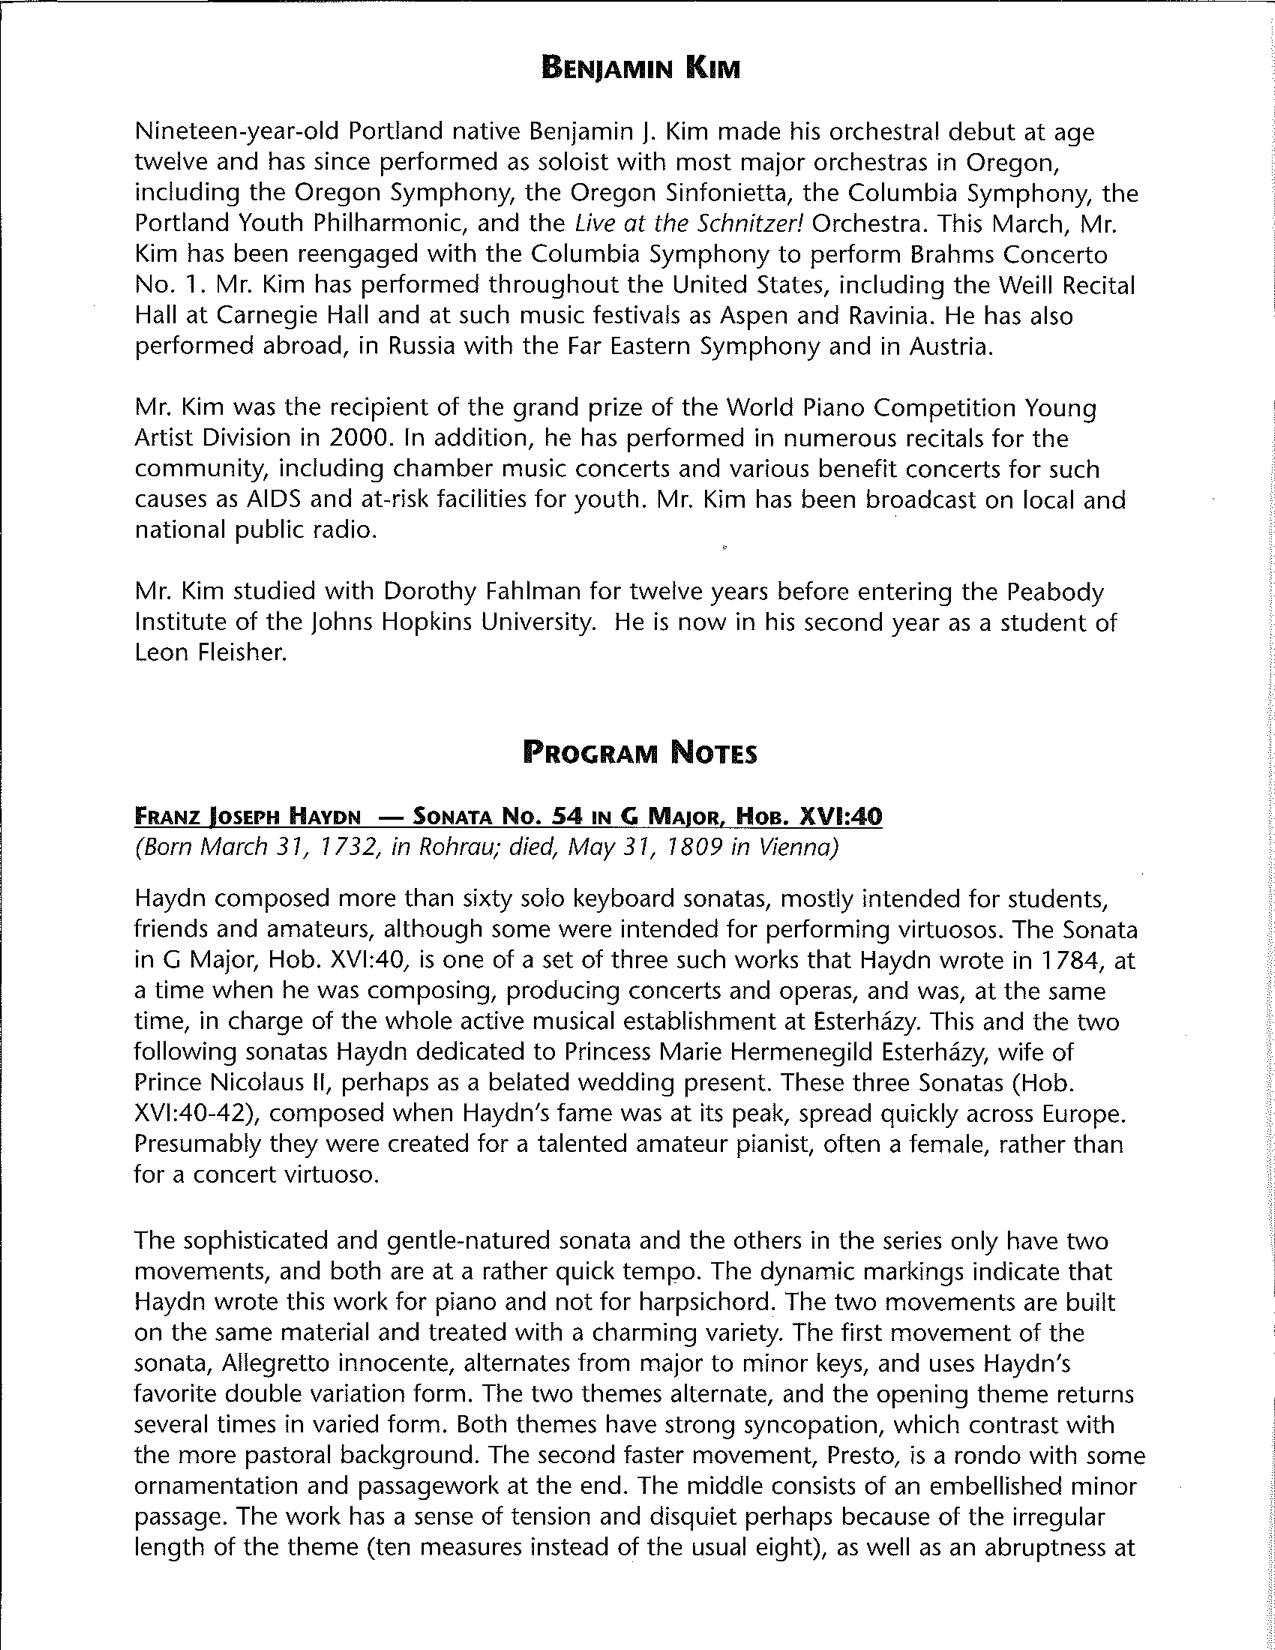 Kim02-03_Program3.jpg